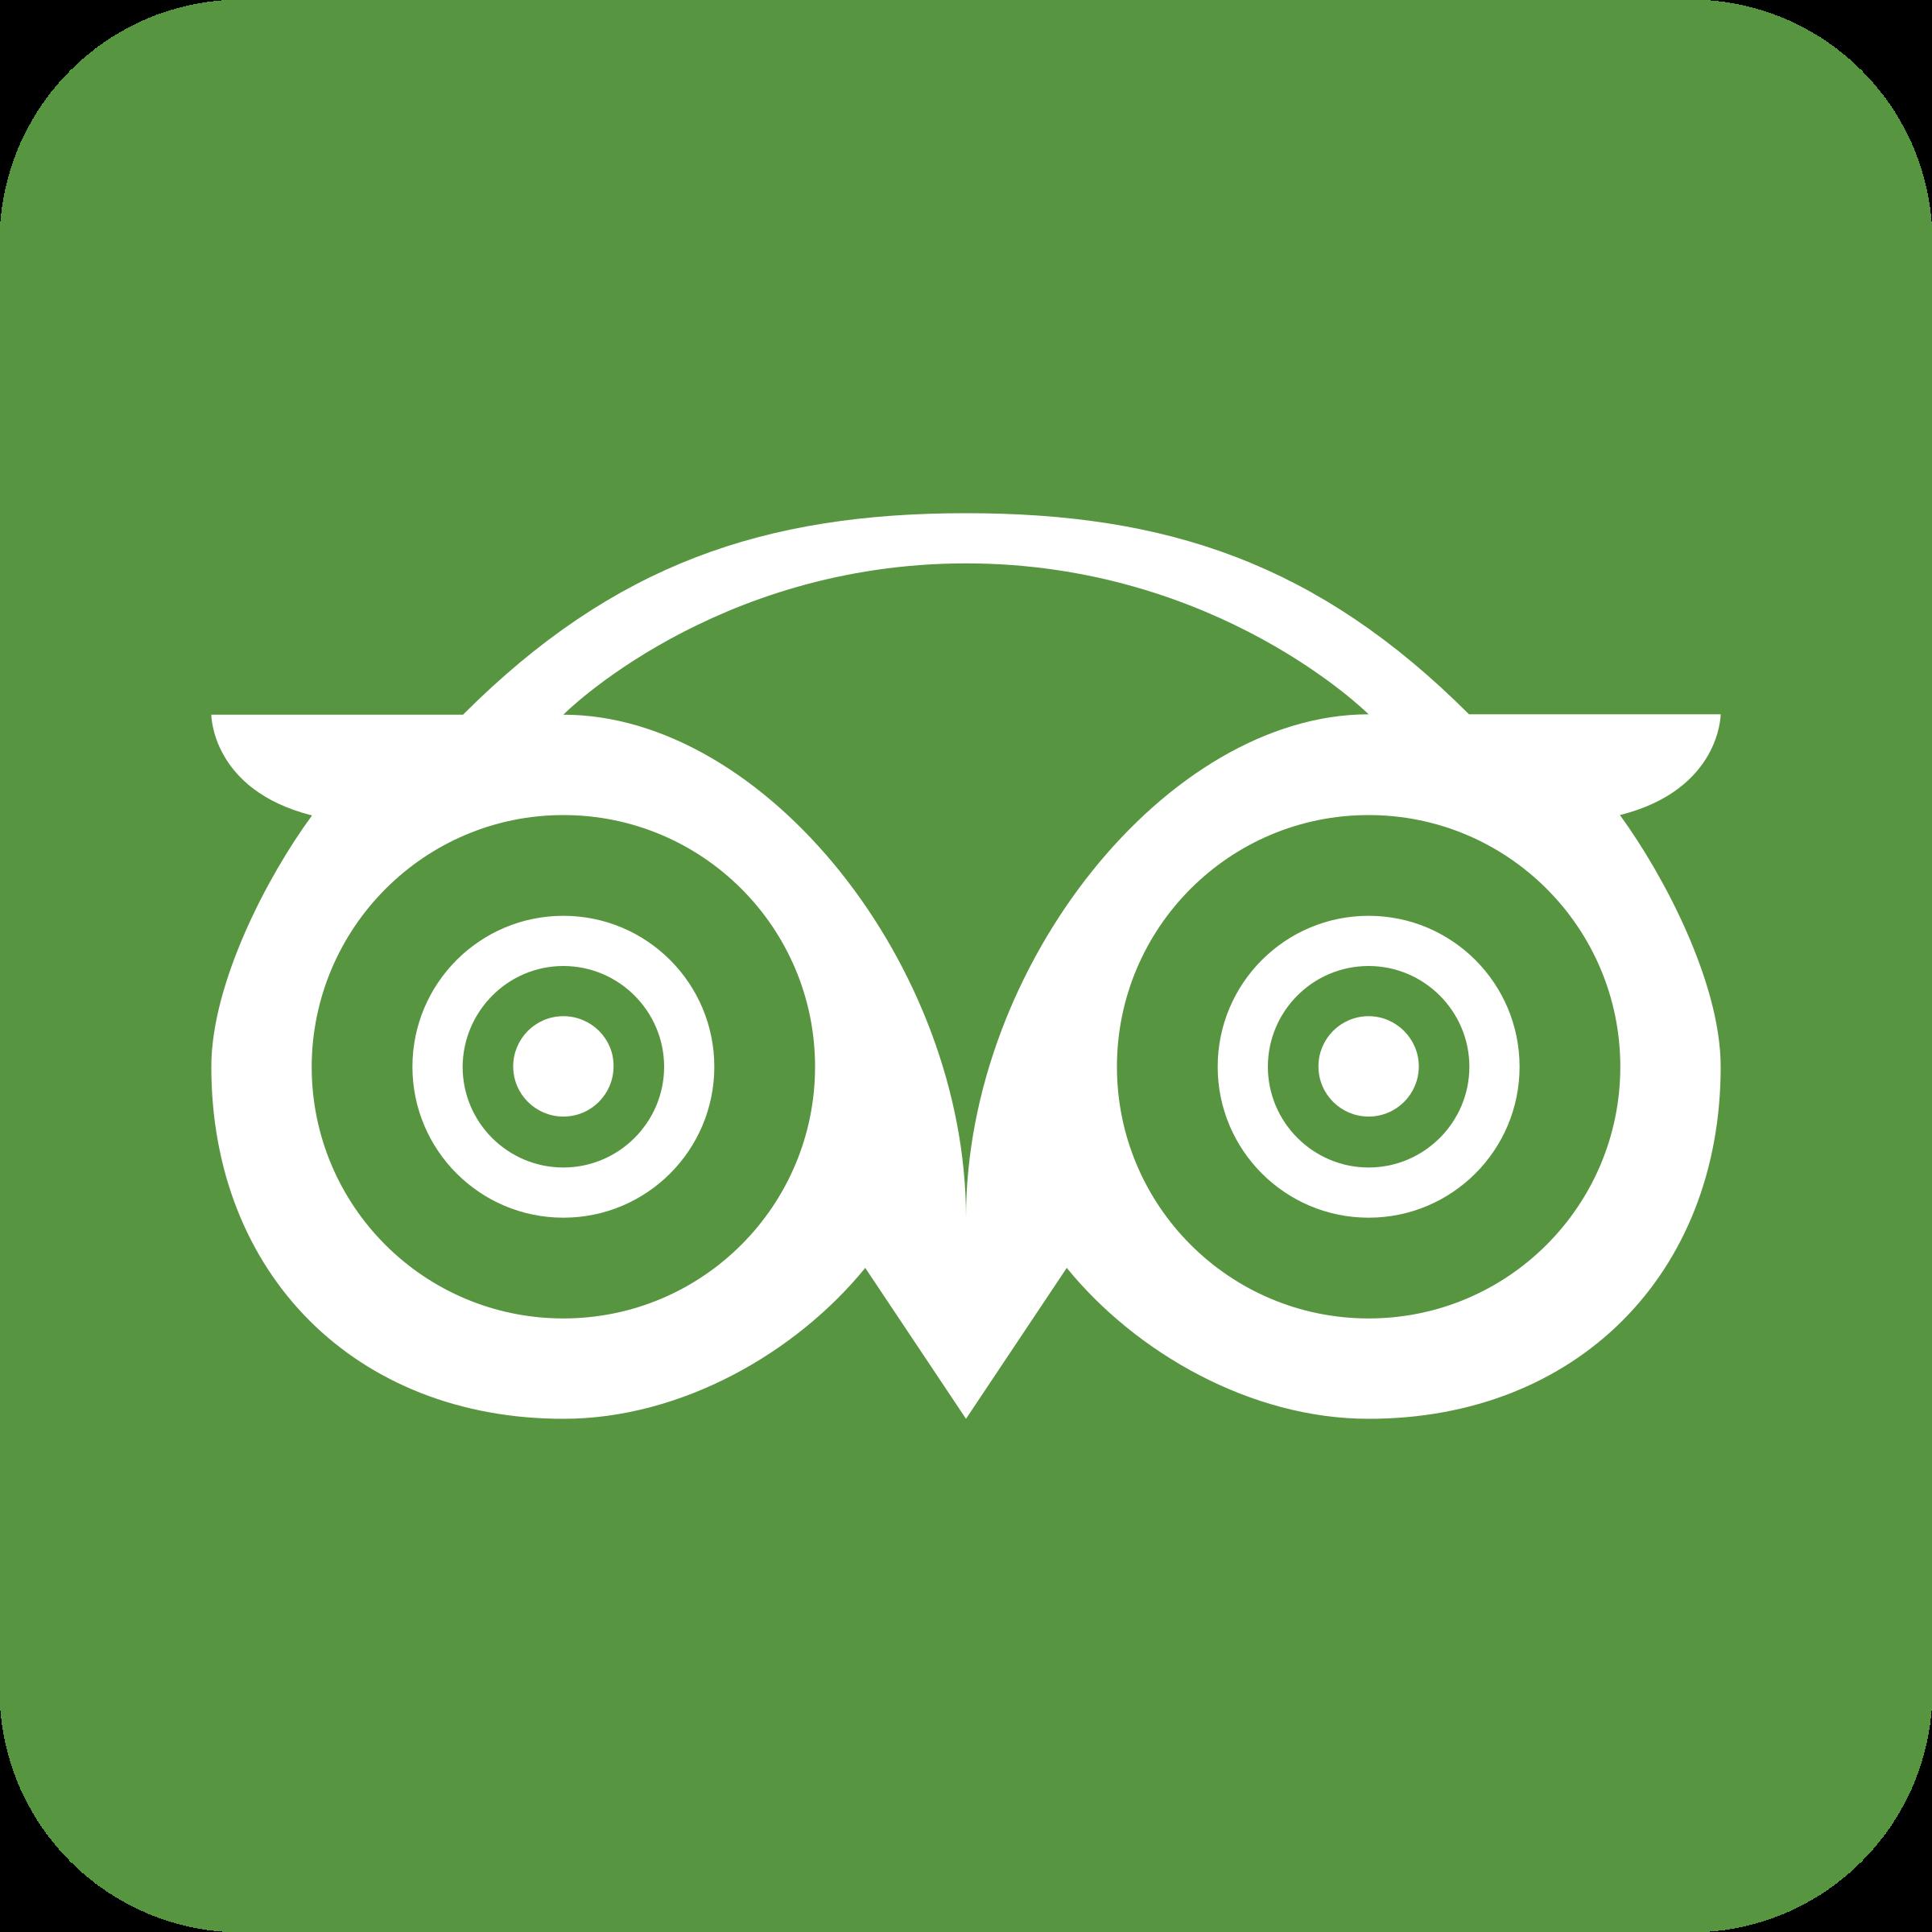 Tripadvisor Logo PNG Transparent & SVG Vector.